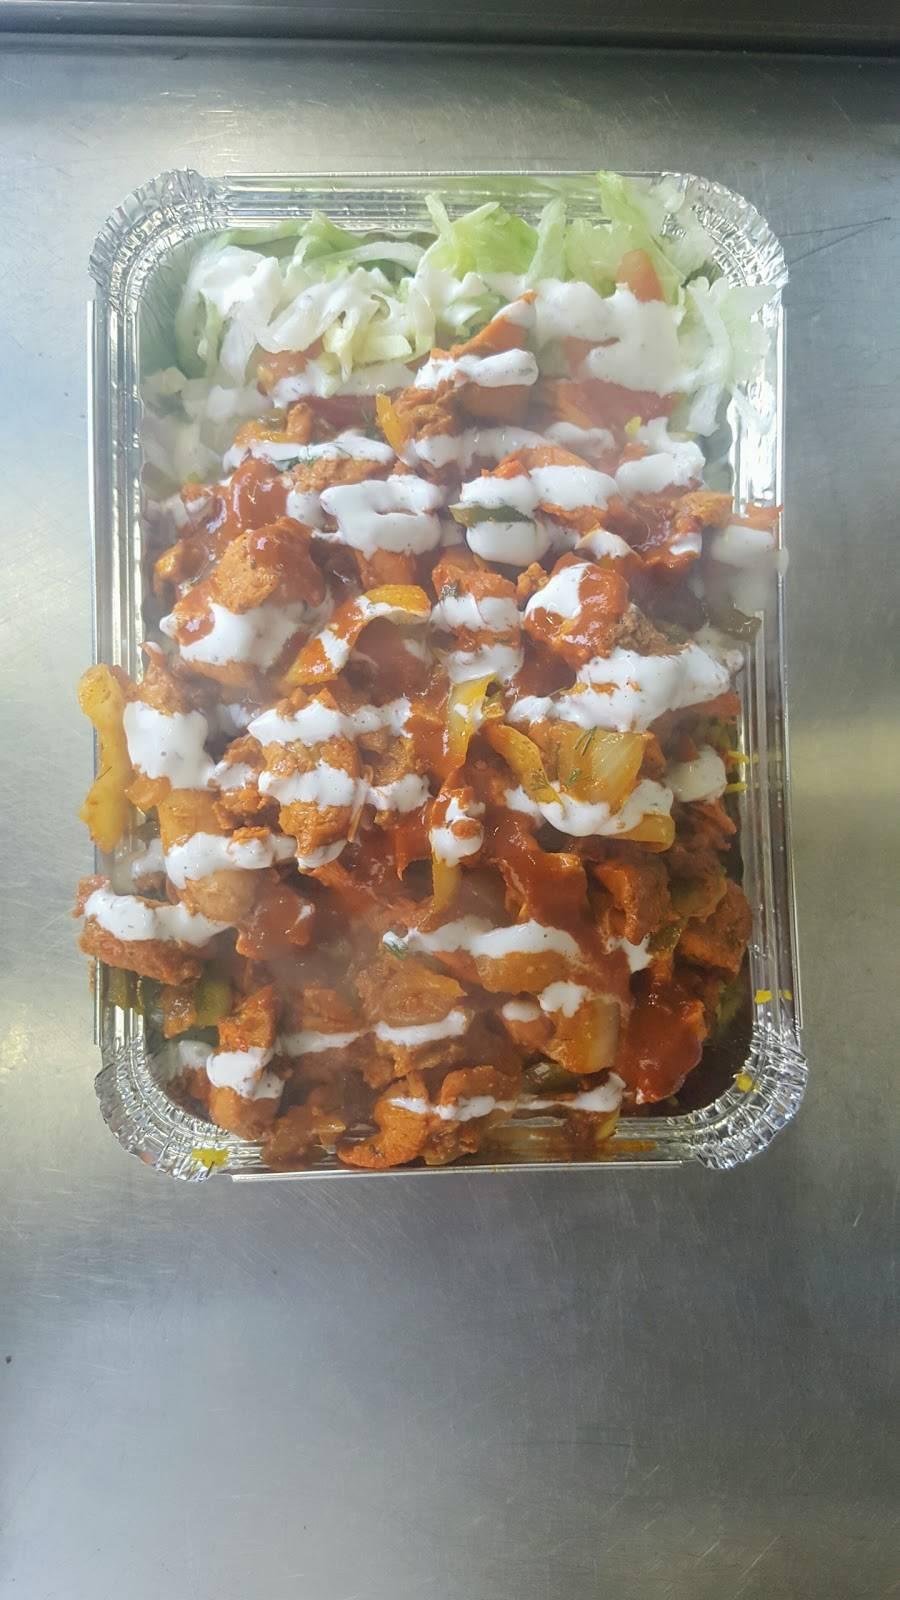 Halal Skinny Guys MIDO   restaurant   1300 Virginia Ave, Bronx, NY 10462, USA   9175006832 OR +1 917-500-6832